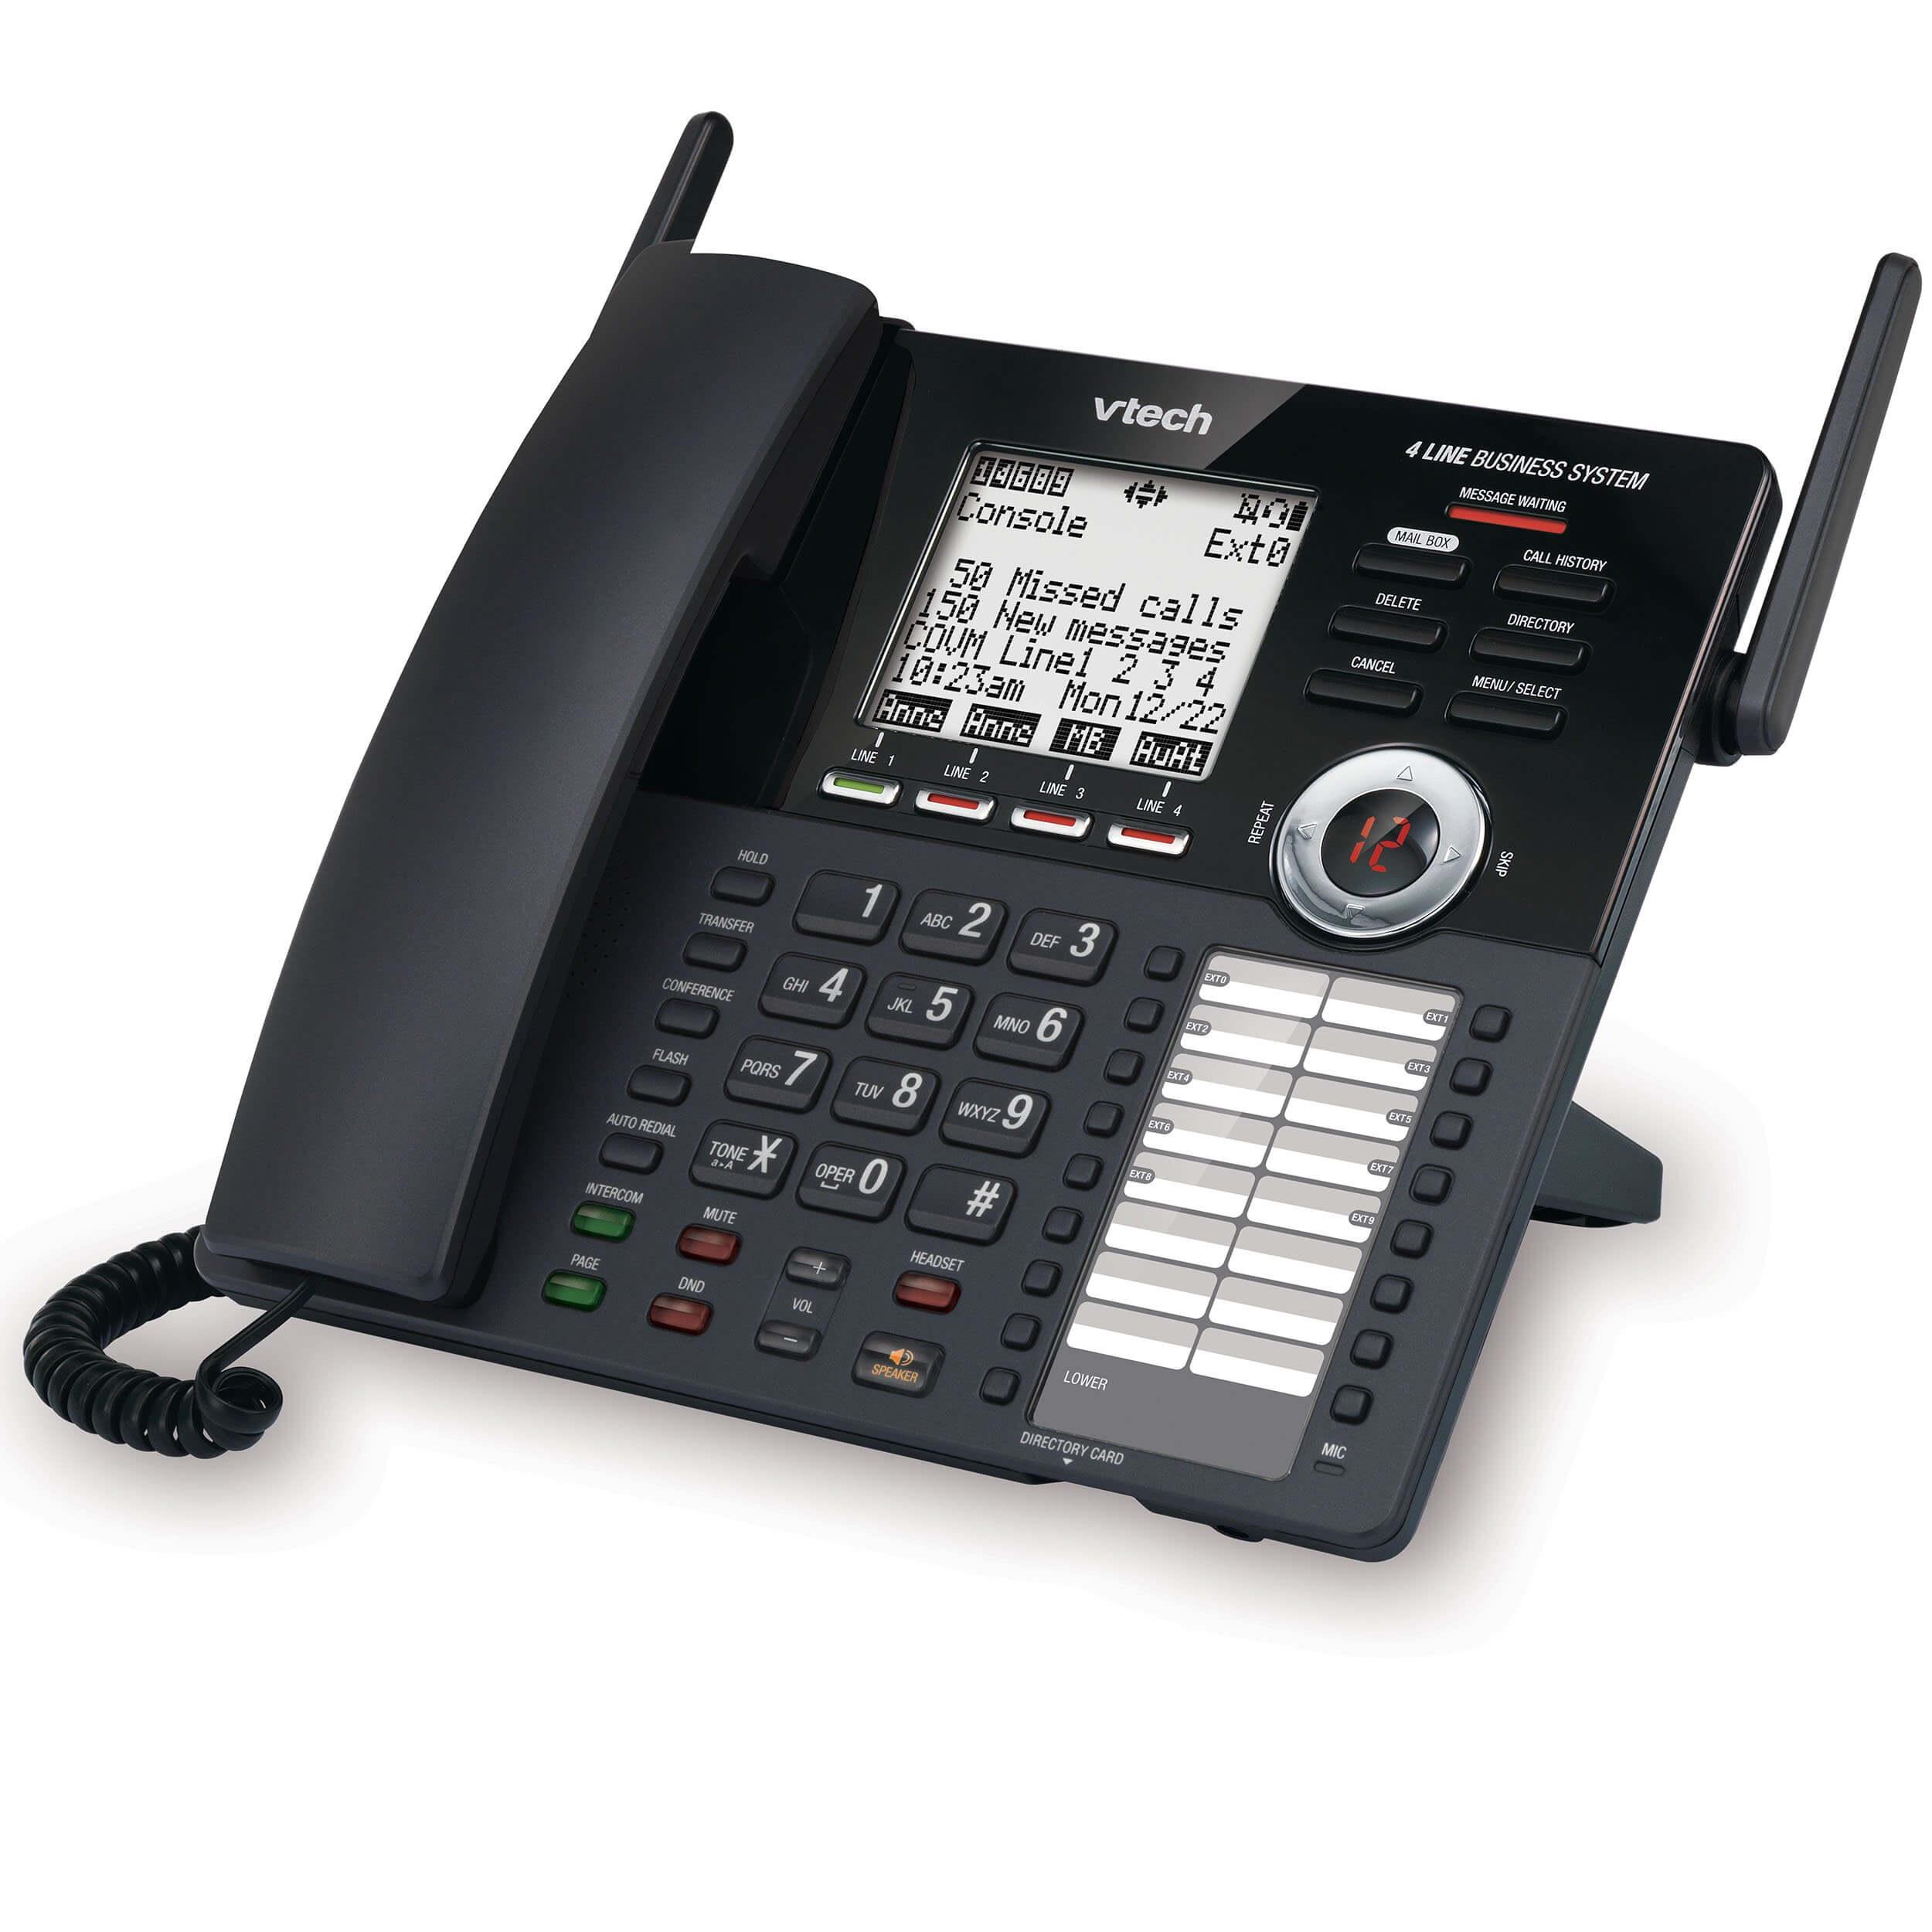 VTech 4-Line phone